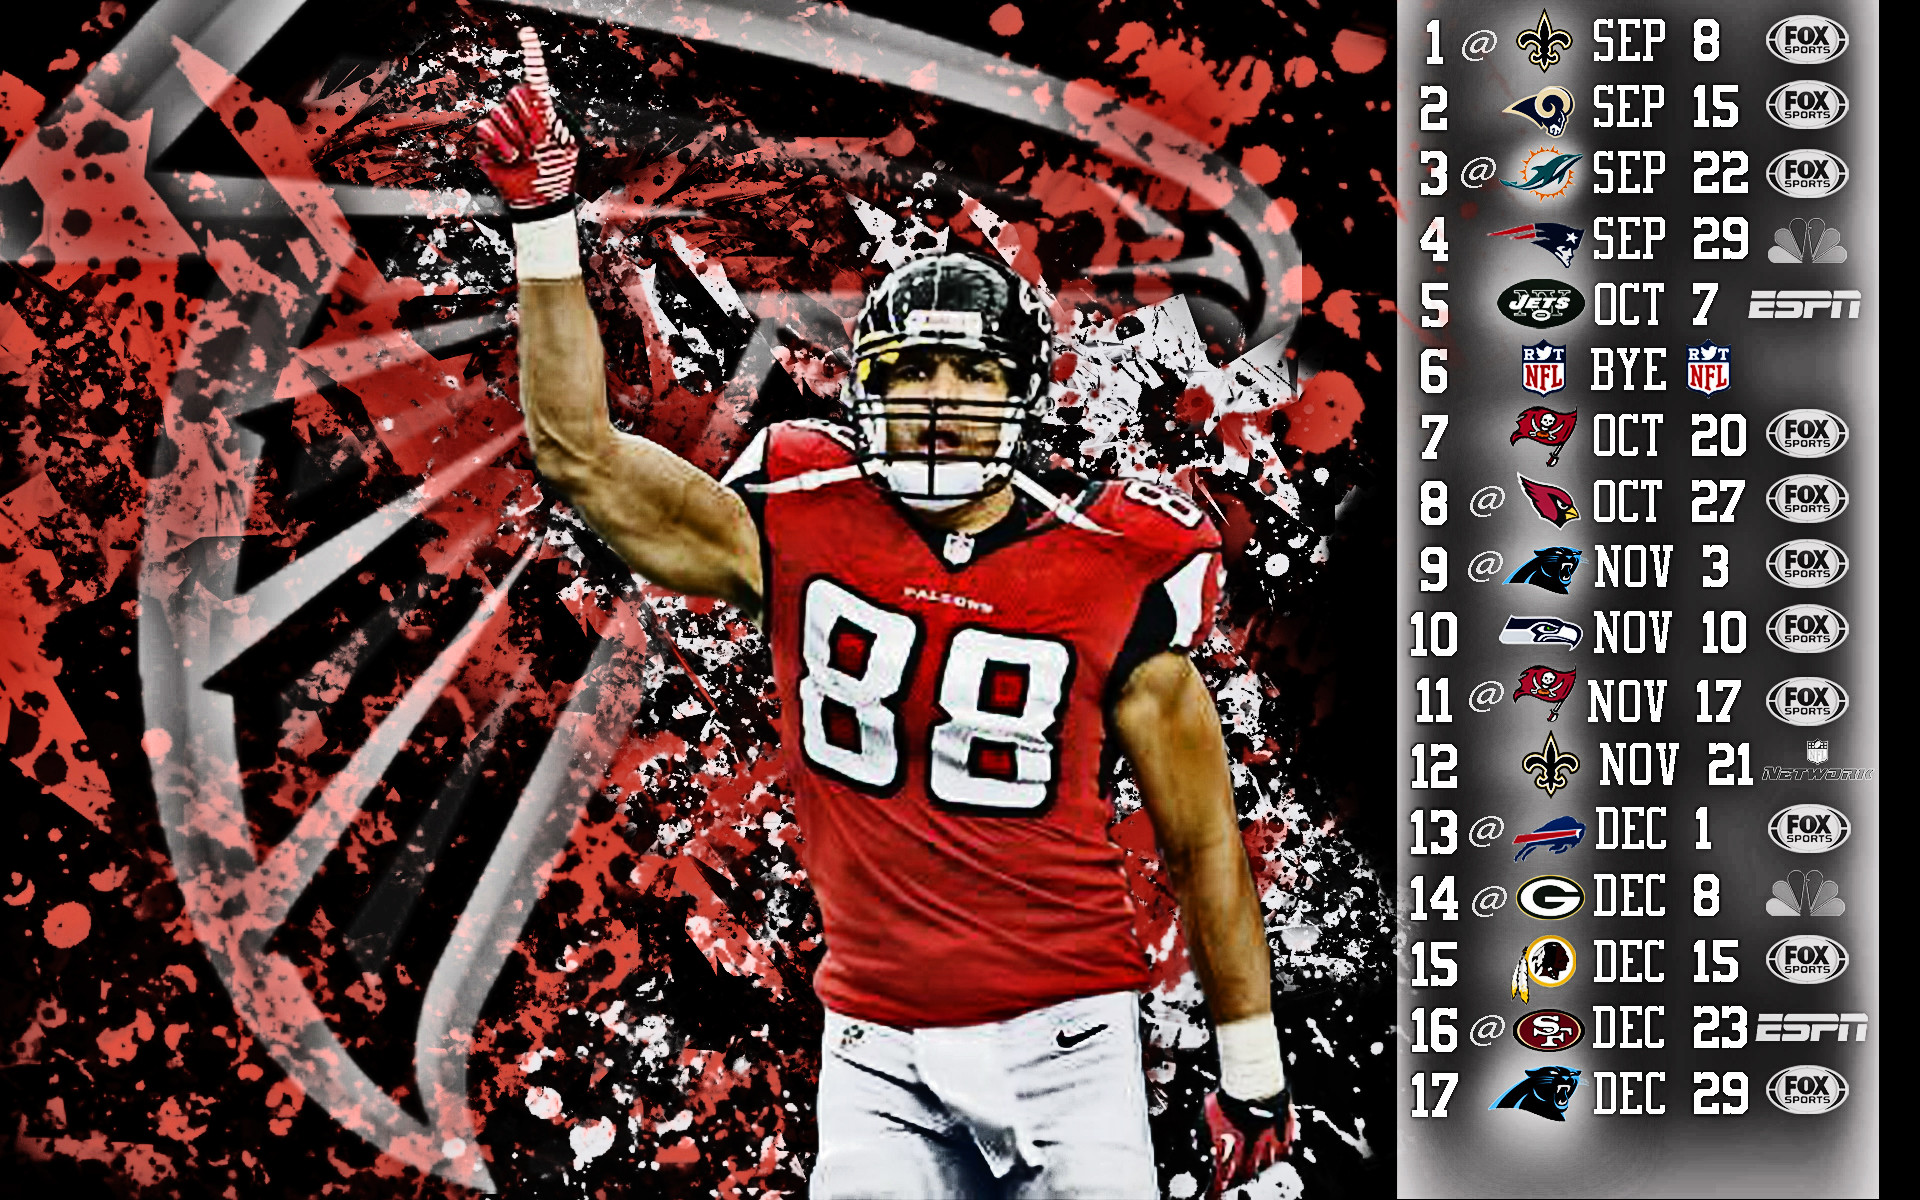 Atlanta Falcons Wallpapers Hd: Atlanta Falcons 2018 Wallpaper HD (64+ Images